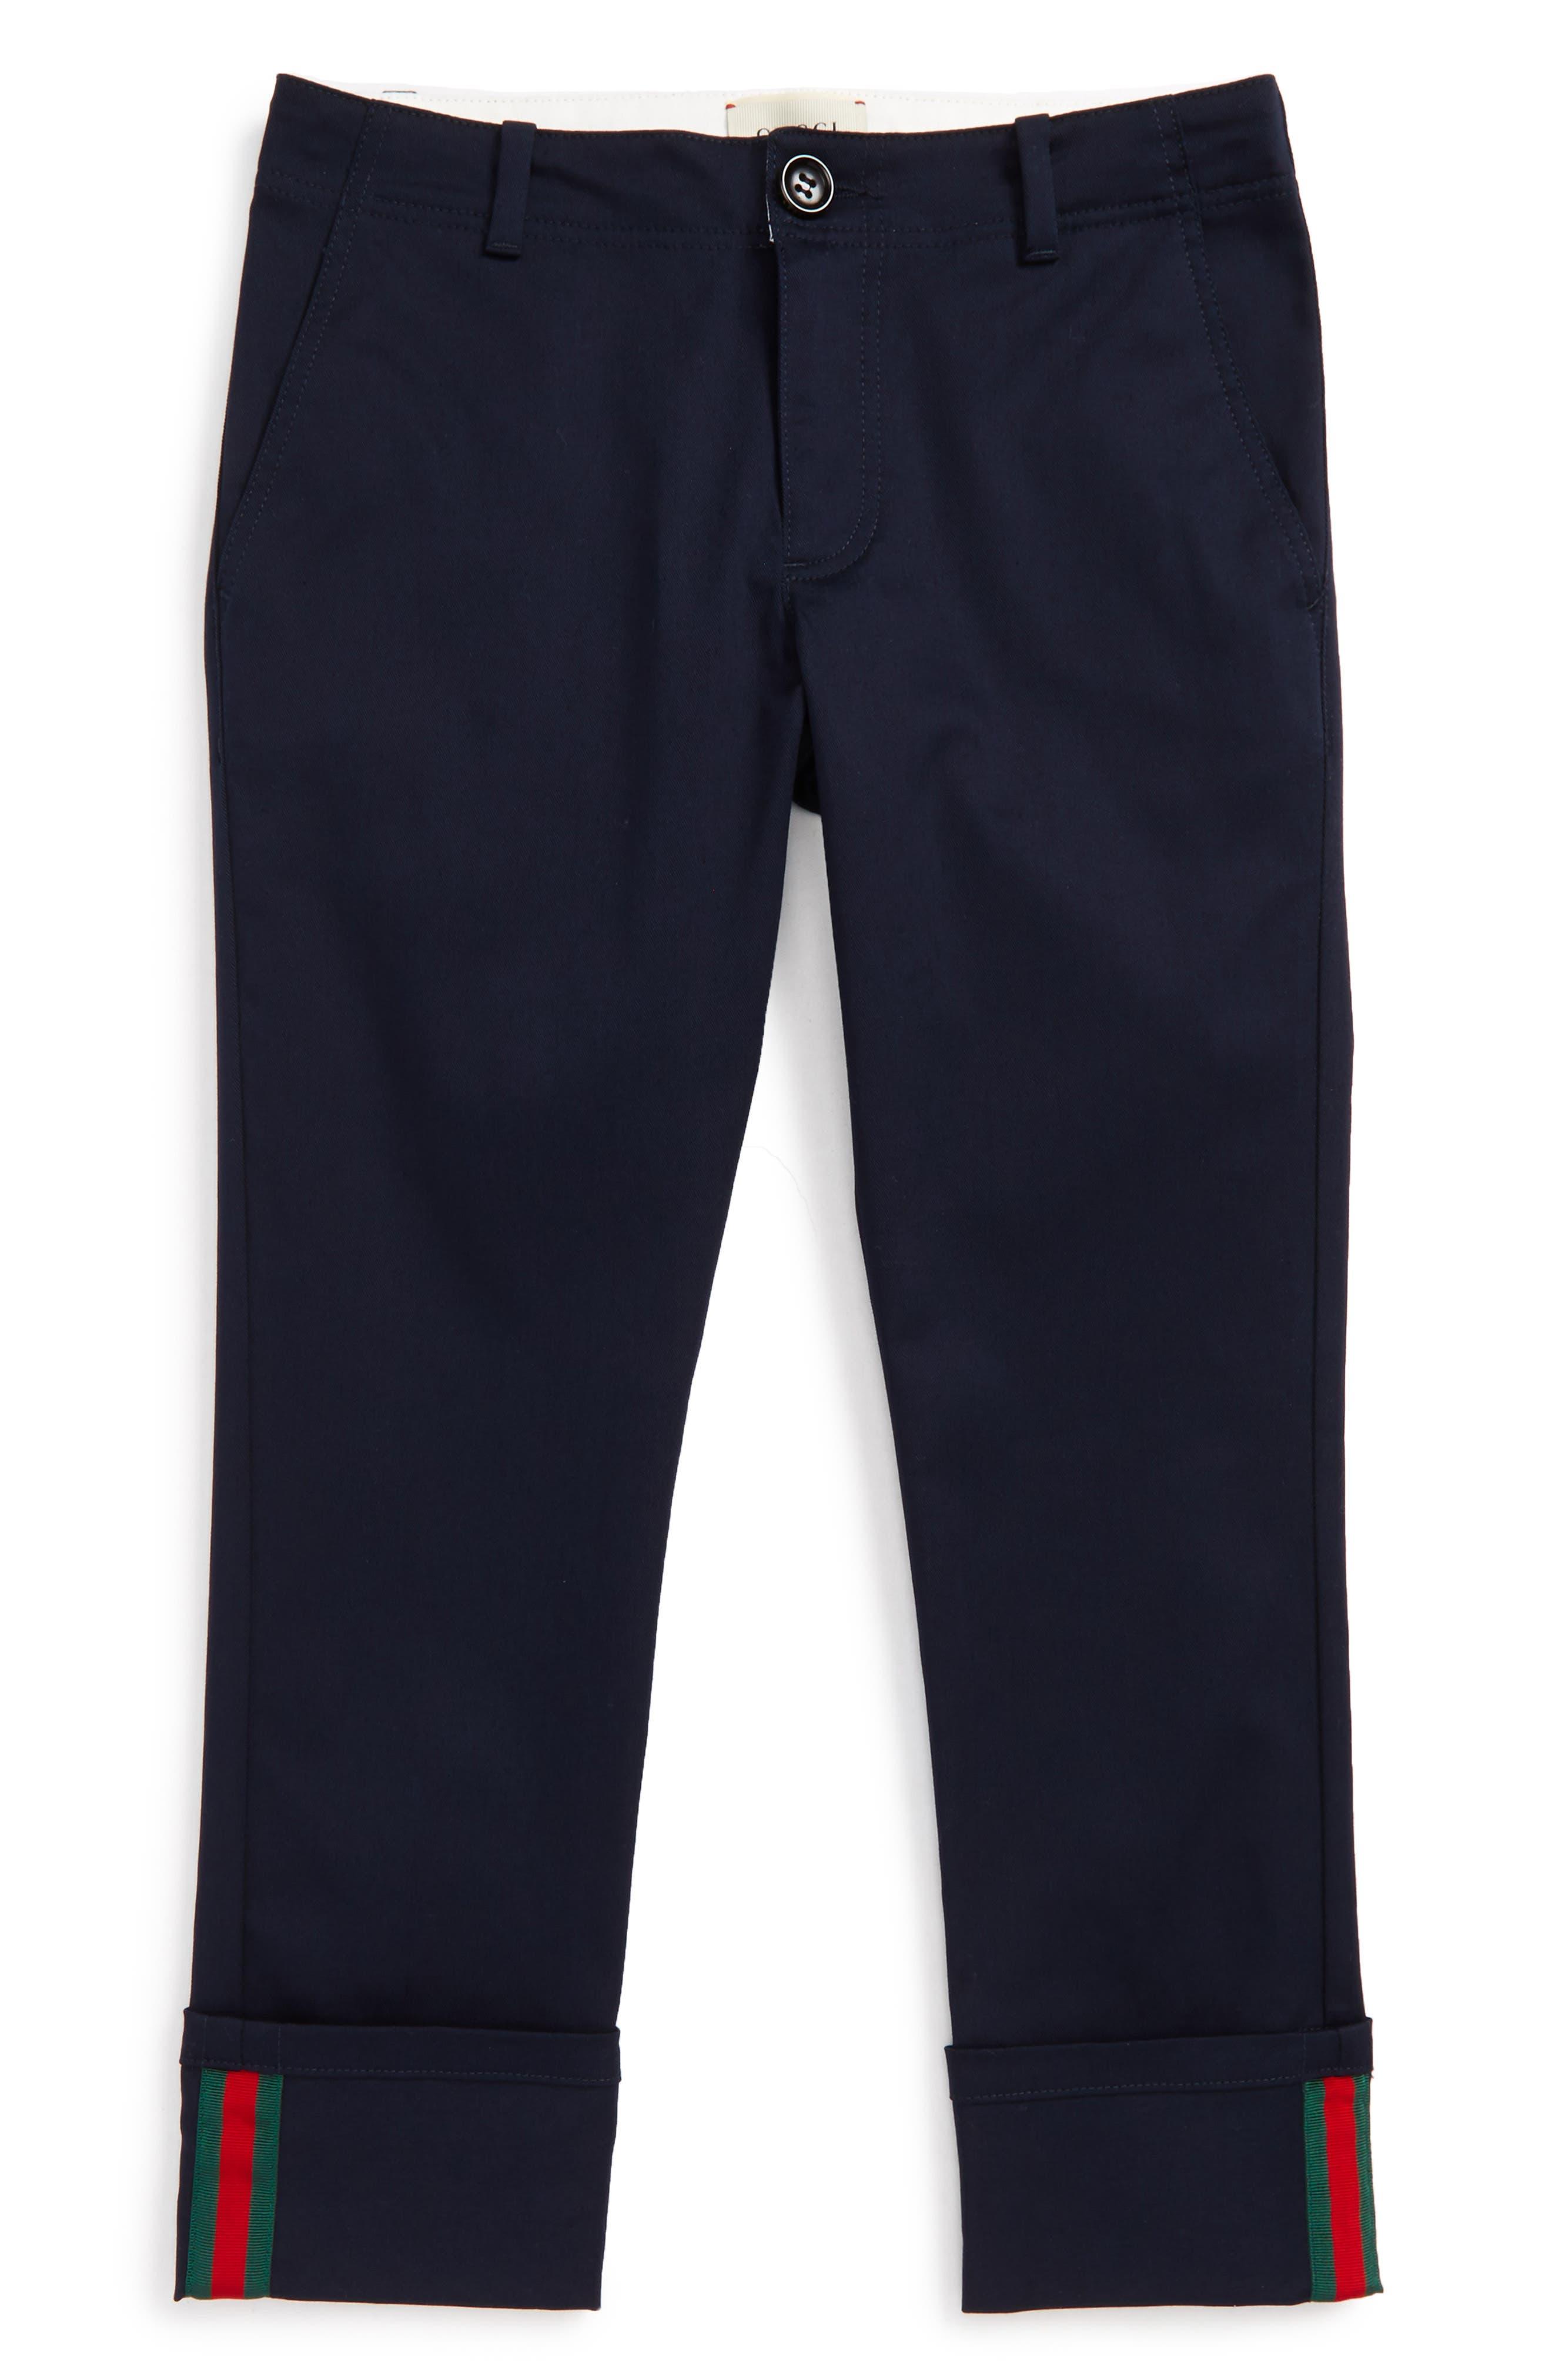 Alternate Image 1 Selected - Gucci Urban Stripe Pants (Little Boys & Big Boys)